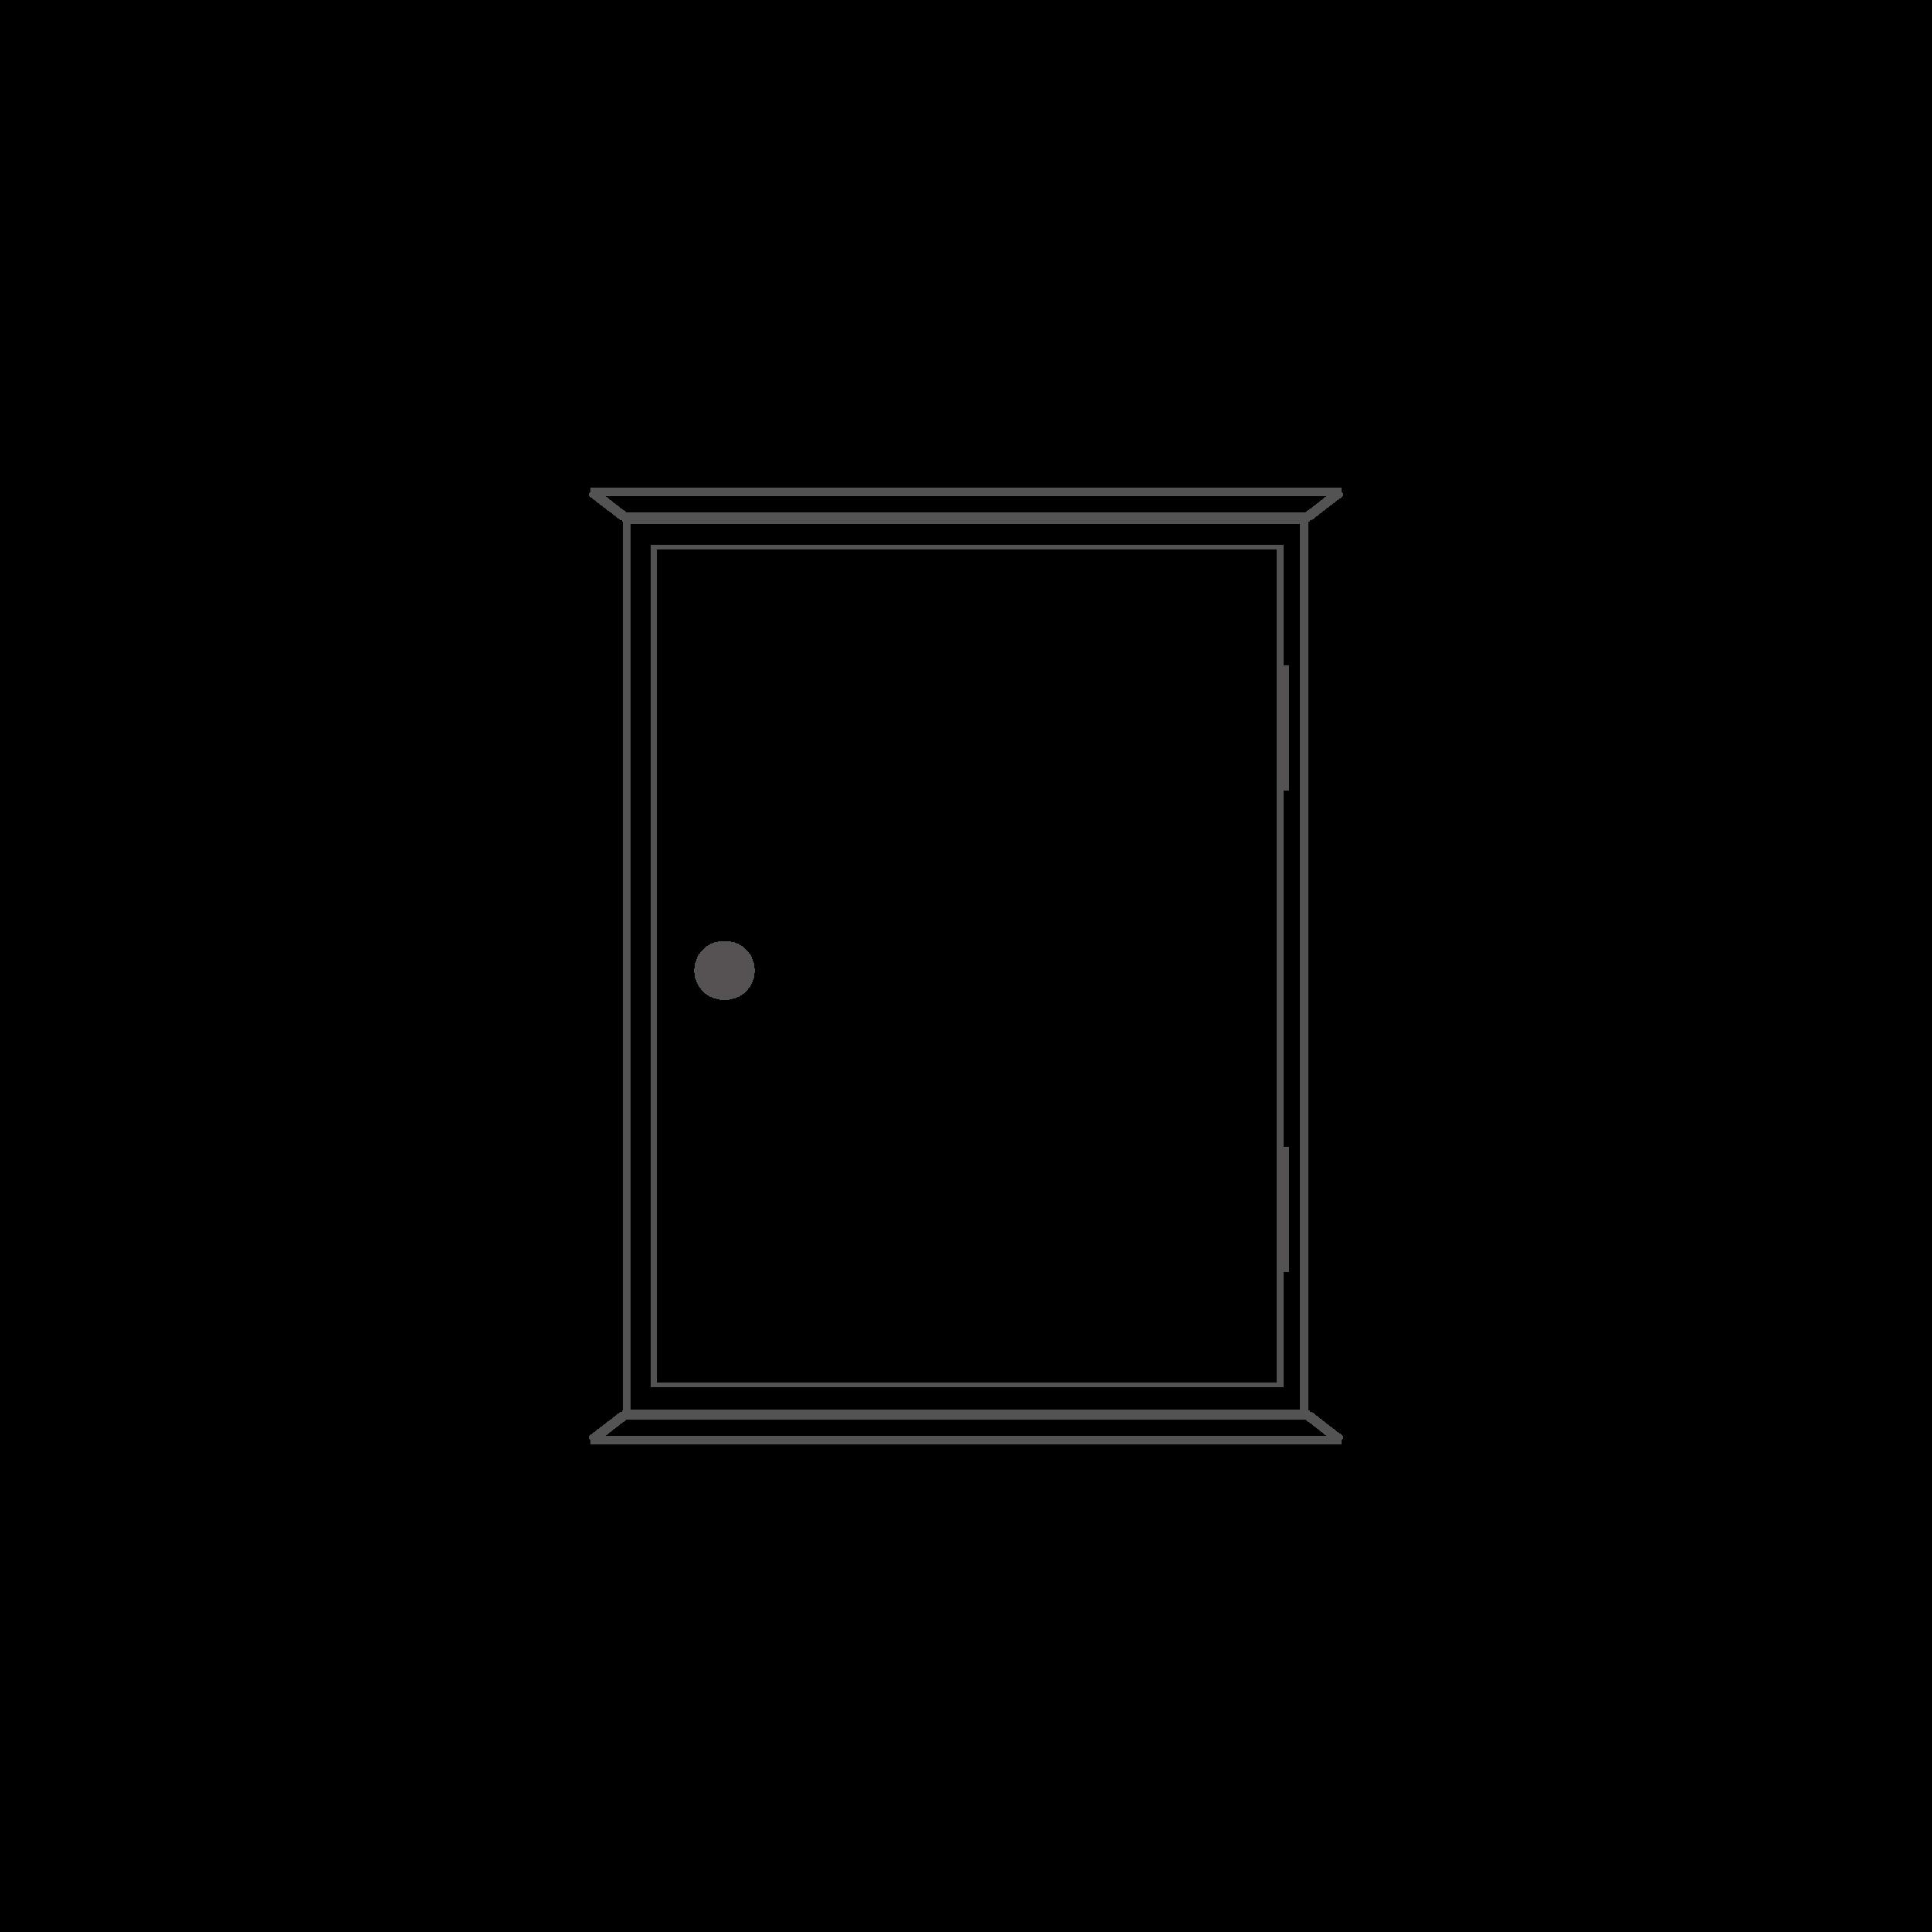 Cabinet outline-01.png